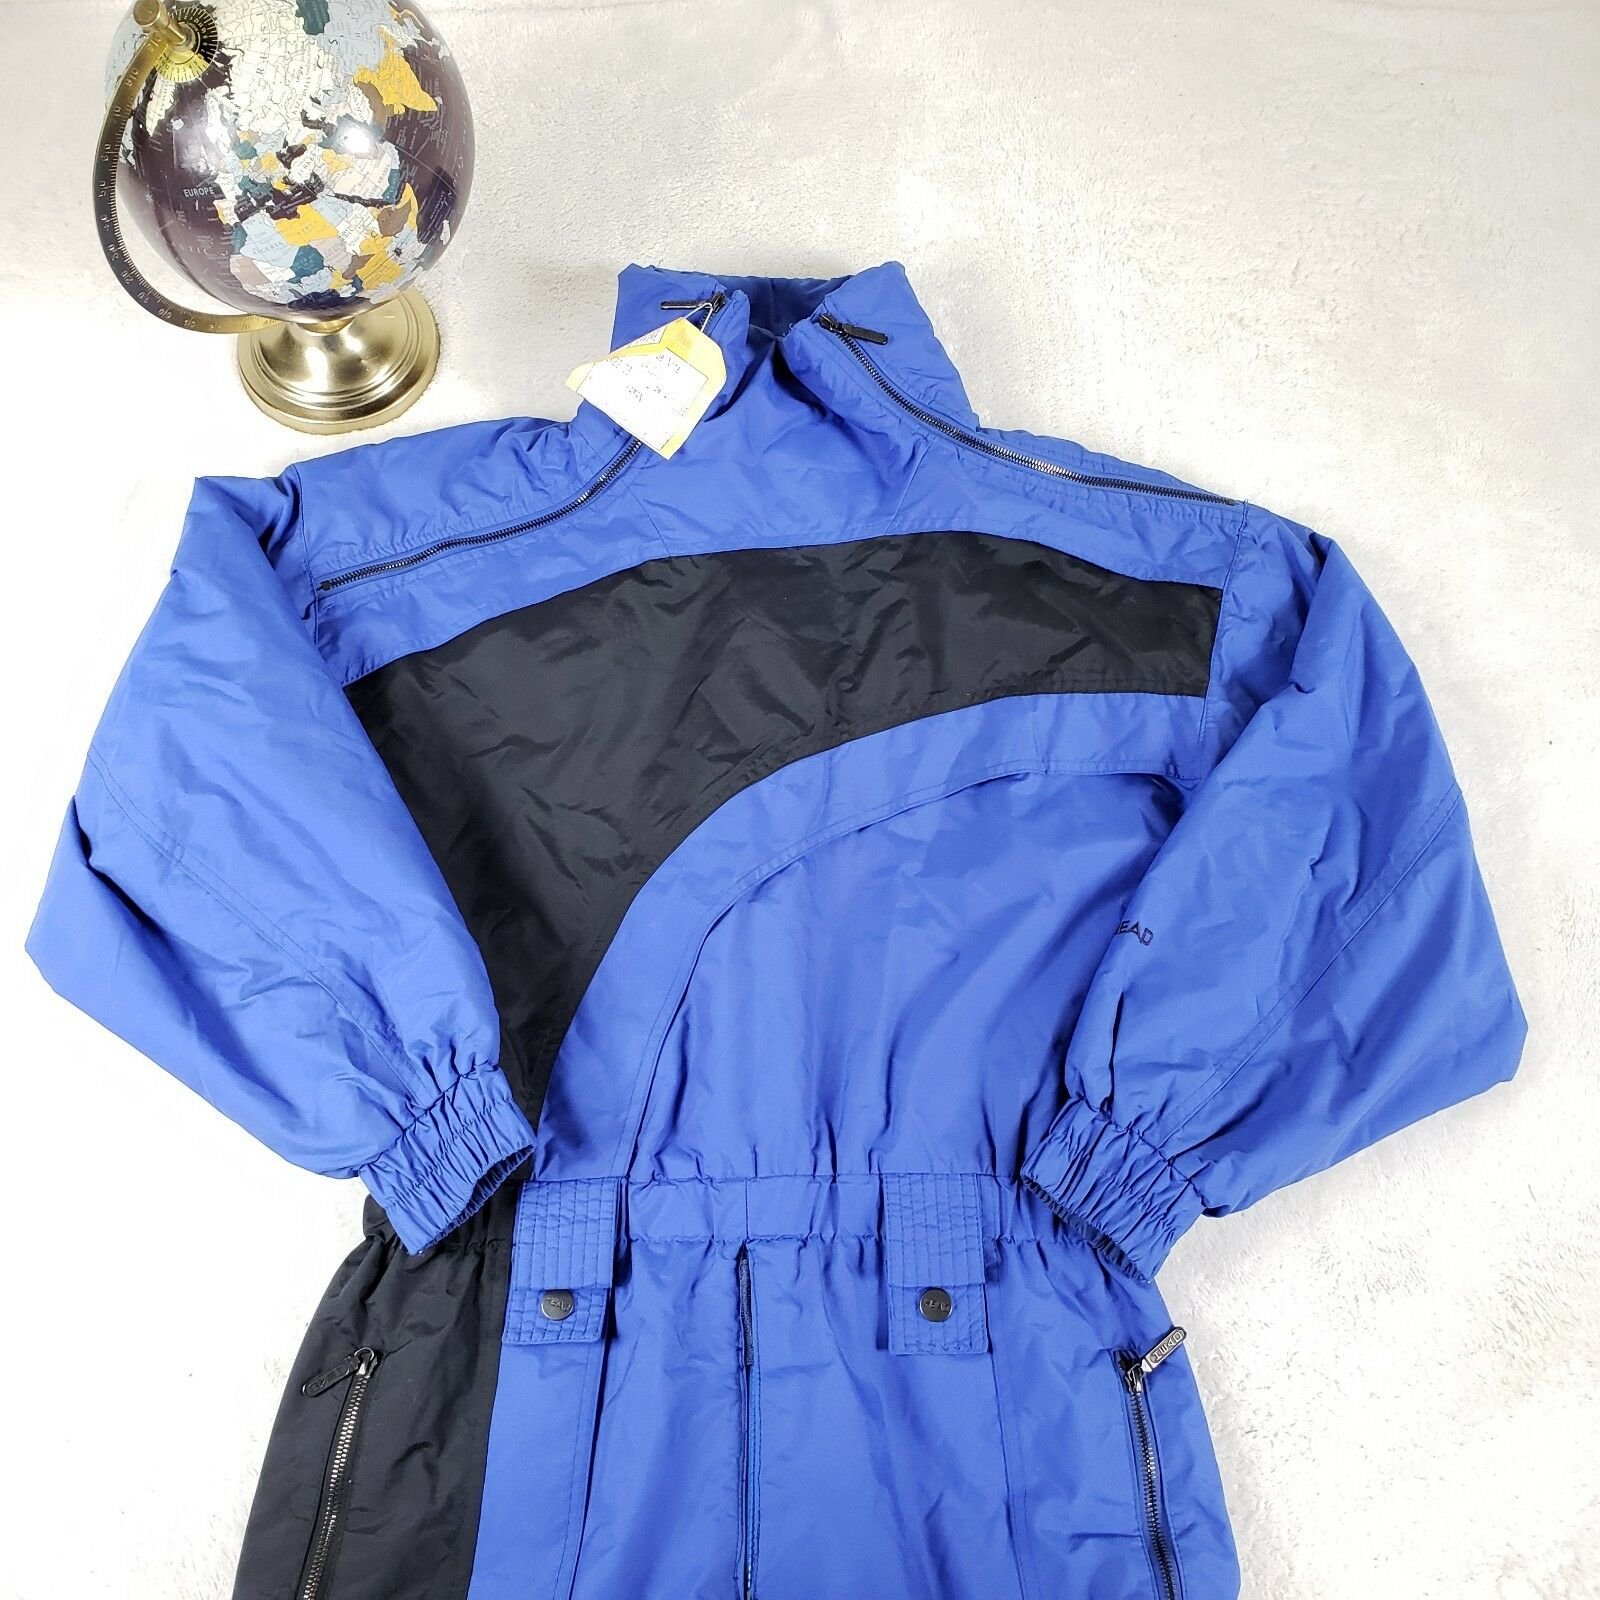 VTG 80s  HEAD One piece Ski Snow Suit Bib O lls bluee Sz Medium  free delivery and returns